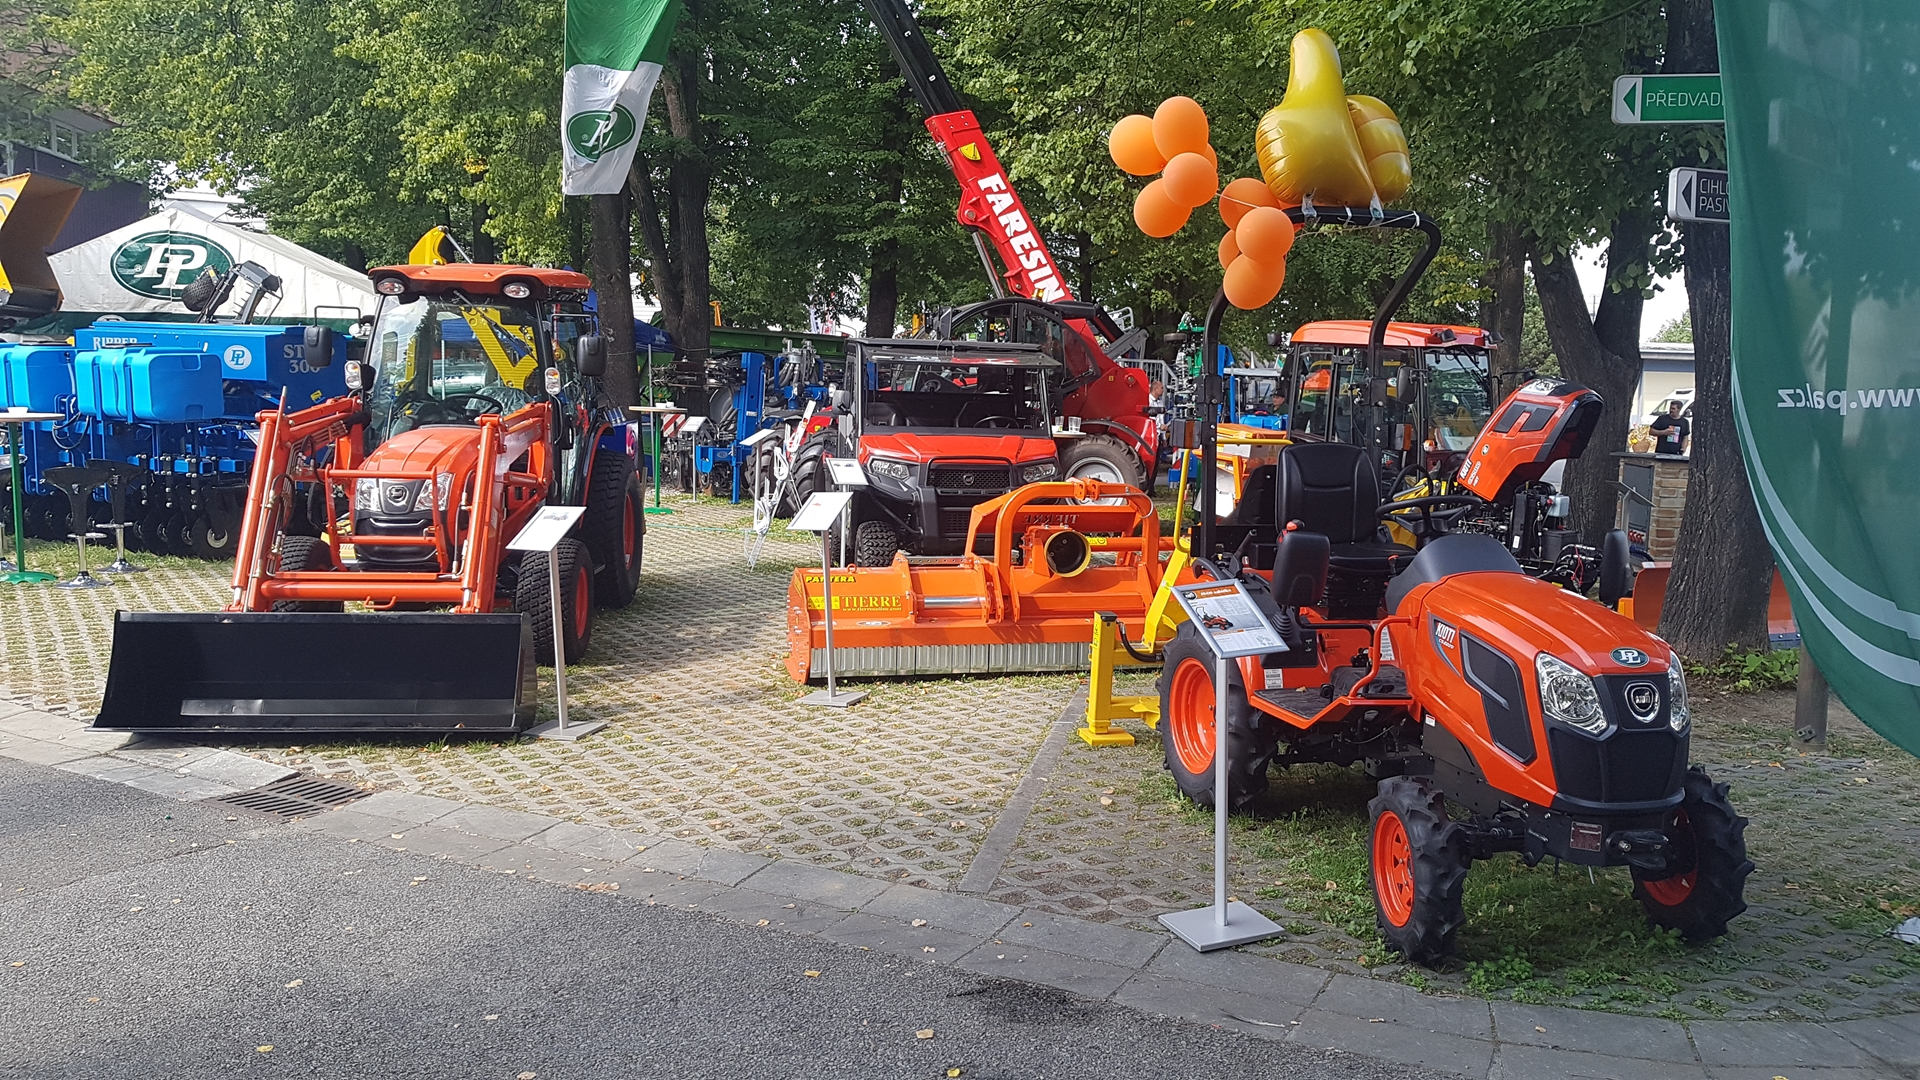 Traktory-Kioti-Zeme-Zivitelka.jpg